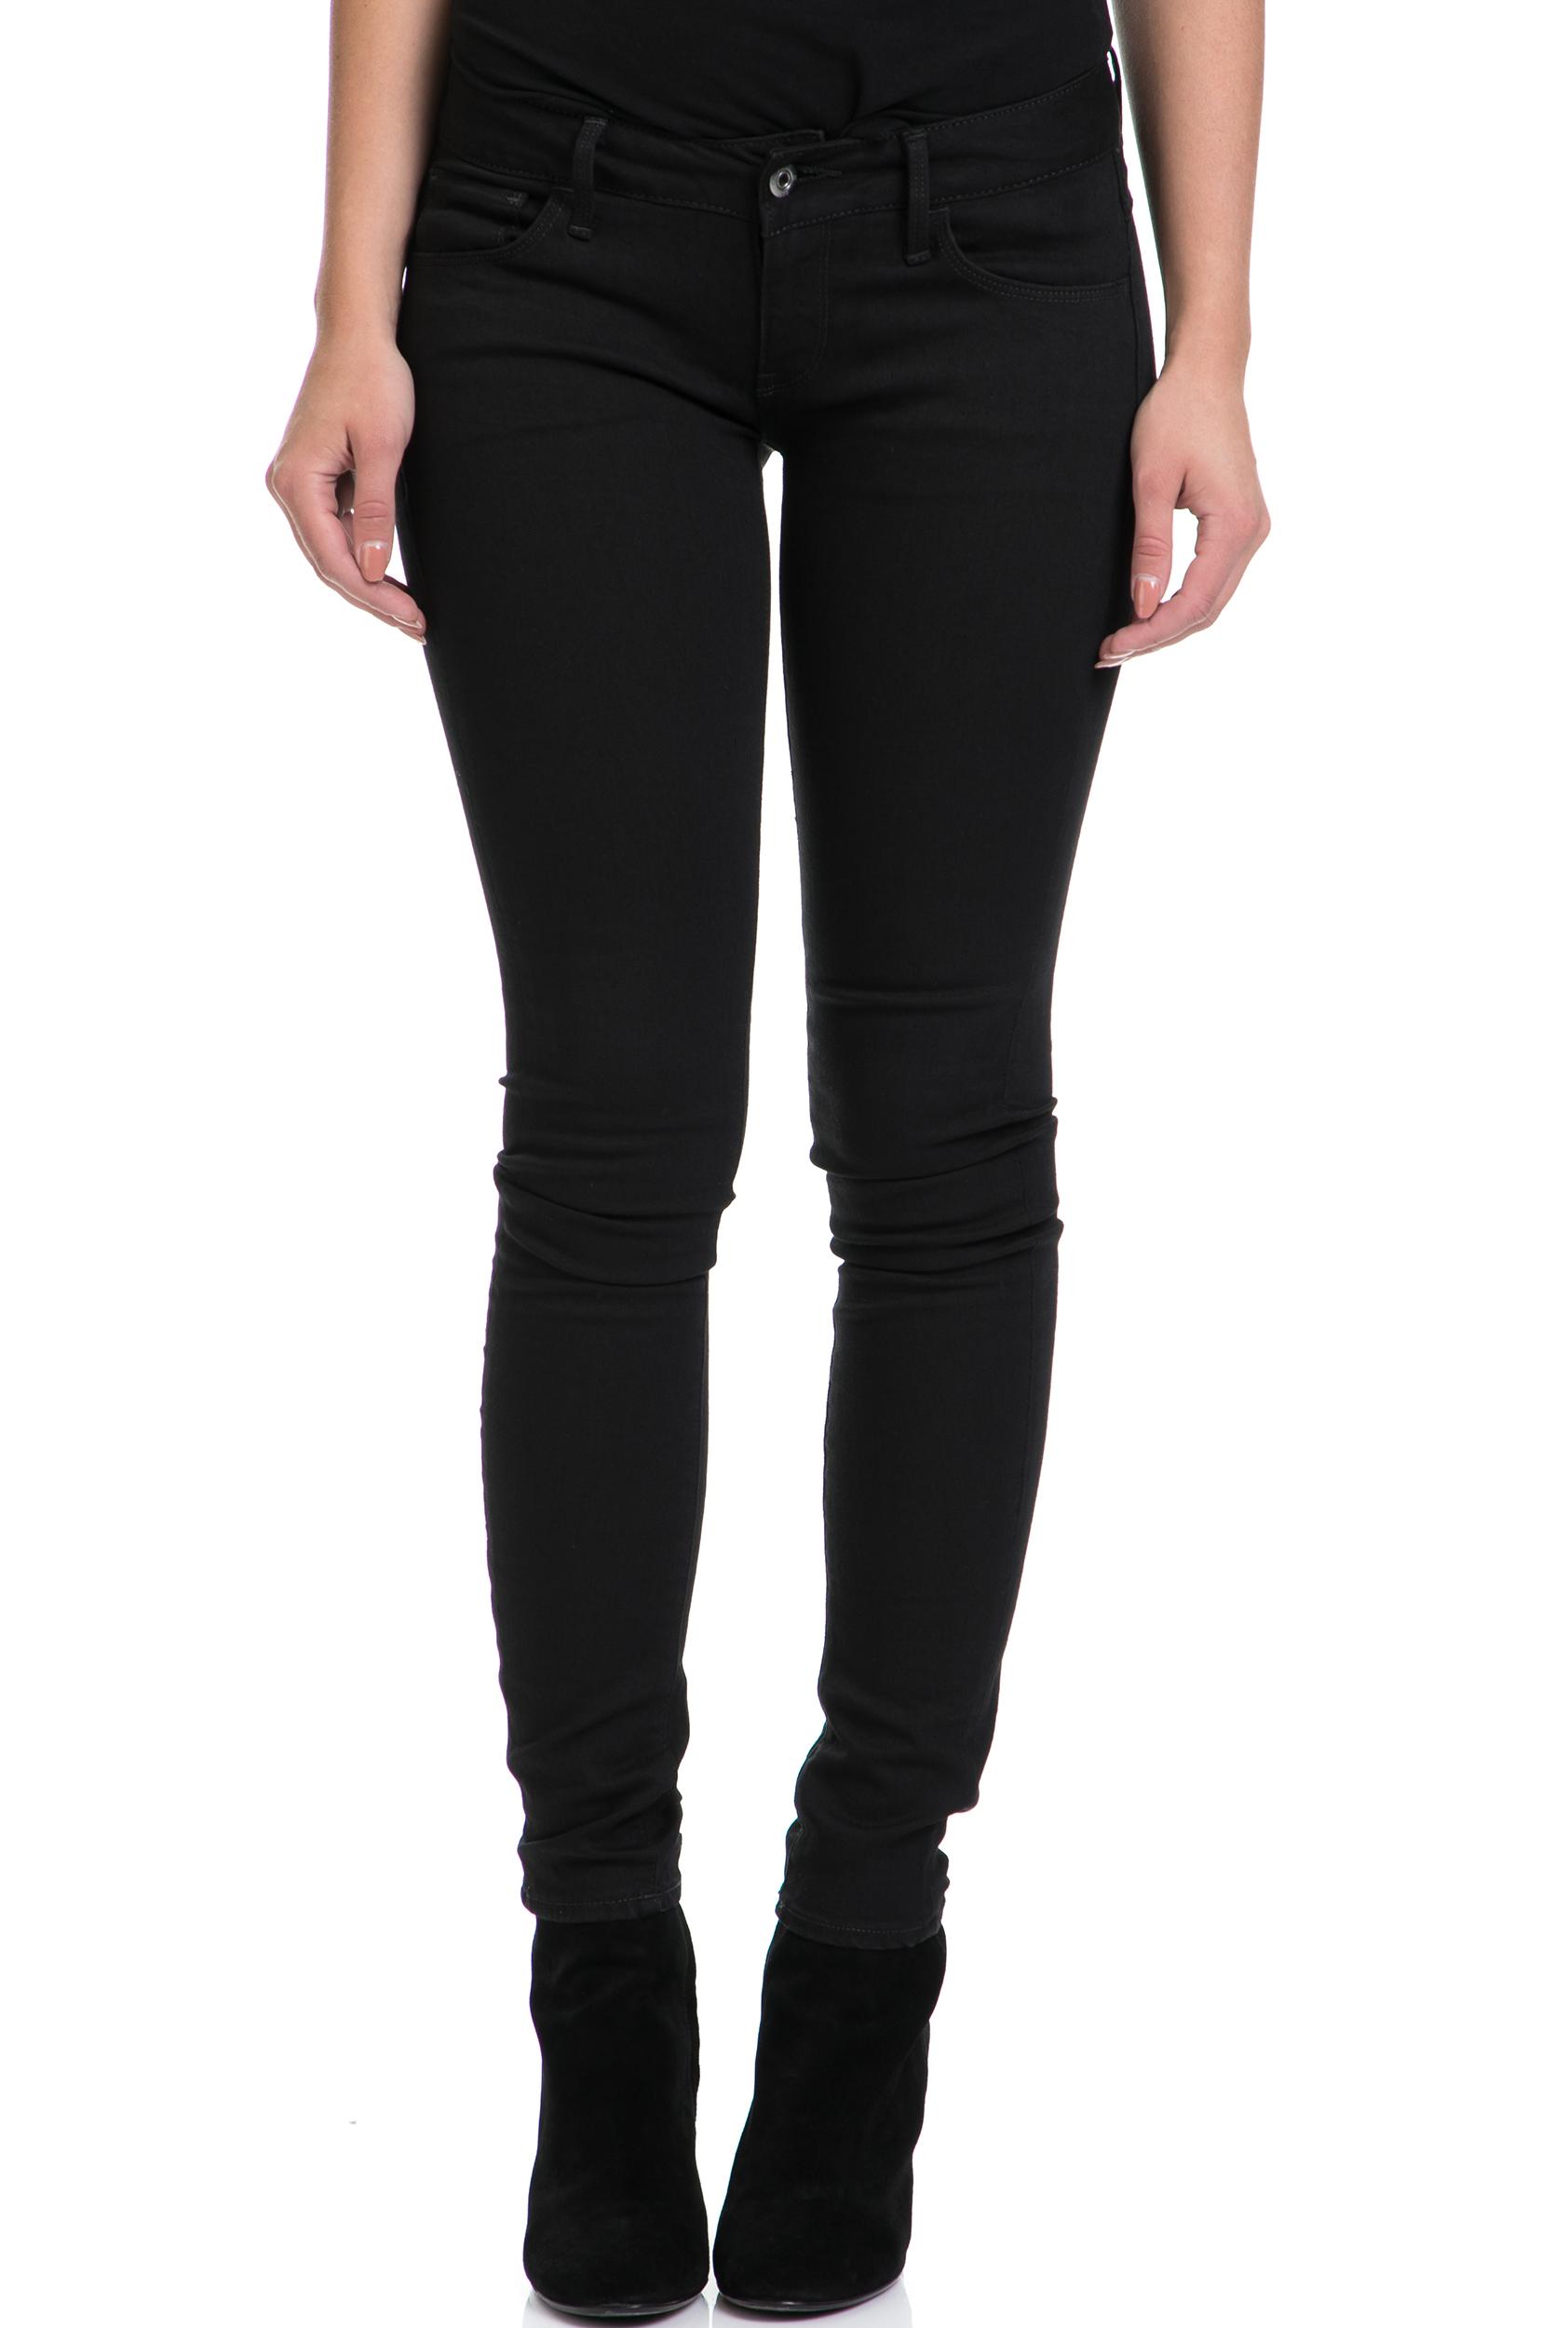 G-STAR - Γυναικείο παντελόνι Deconst Low Skinny G-STAR RAW μαύρο